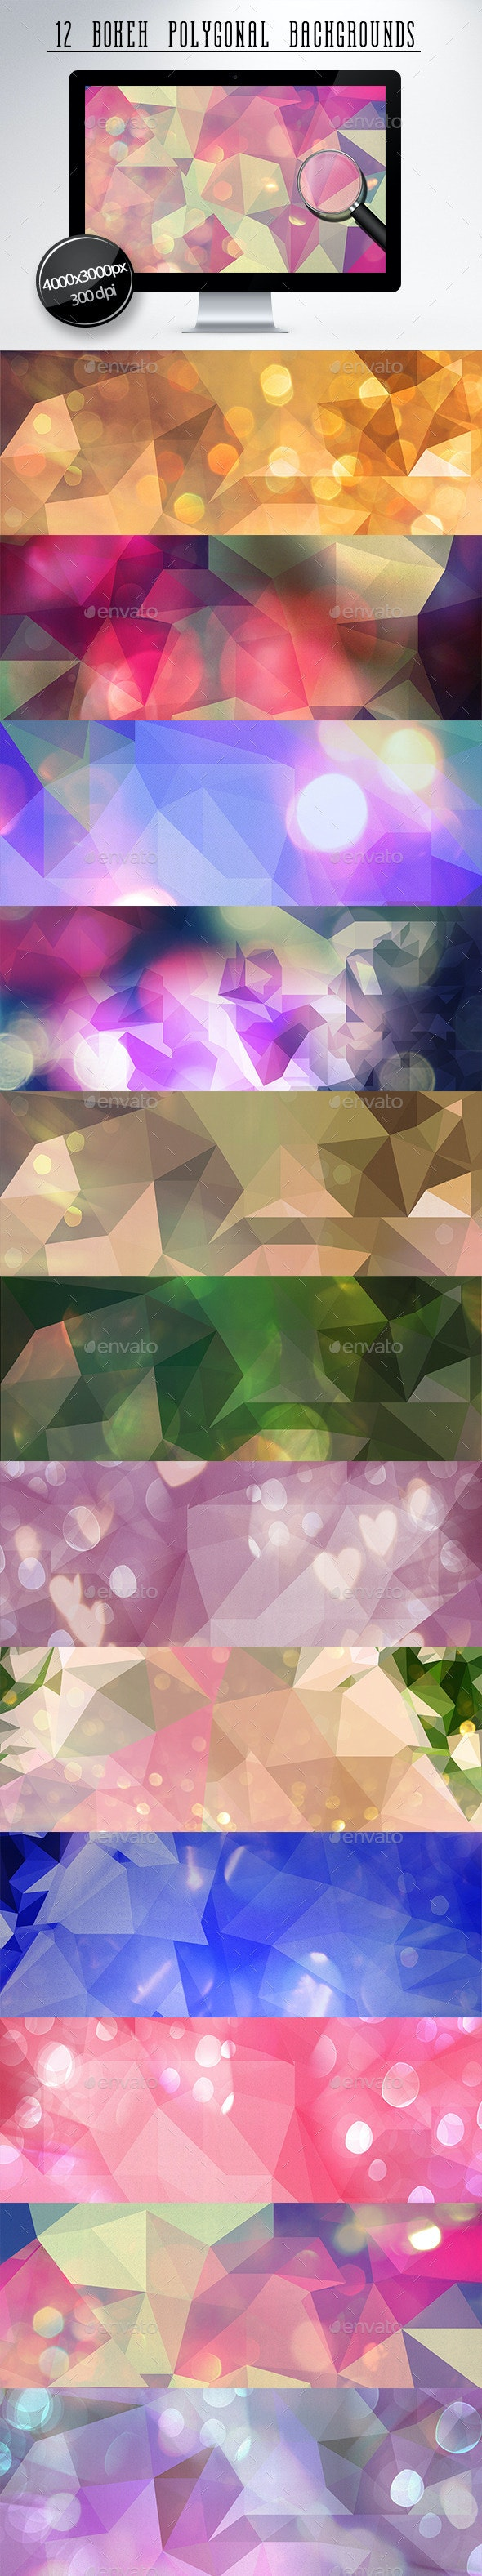 12 Bokeh Polygonal Backgrounds - Backgrounds Graphics